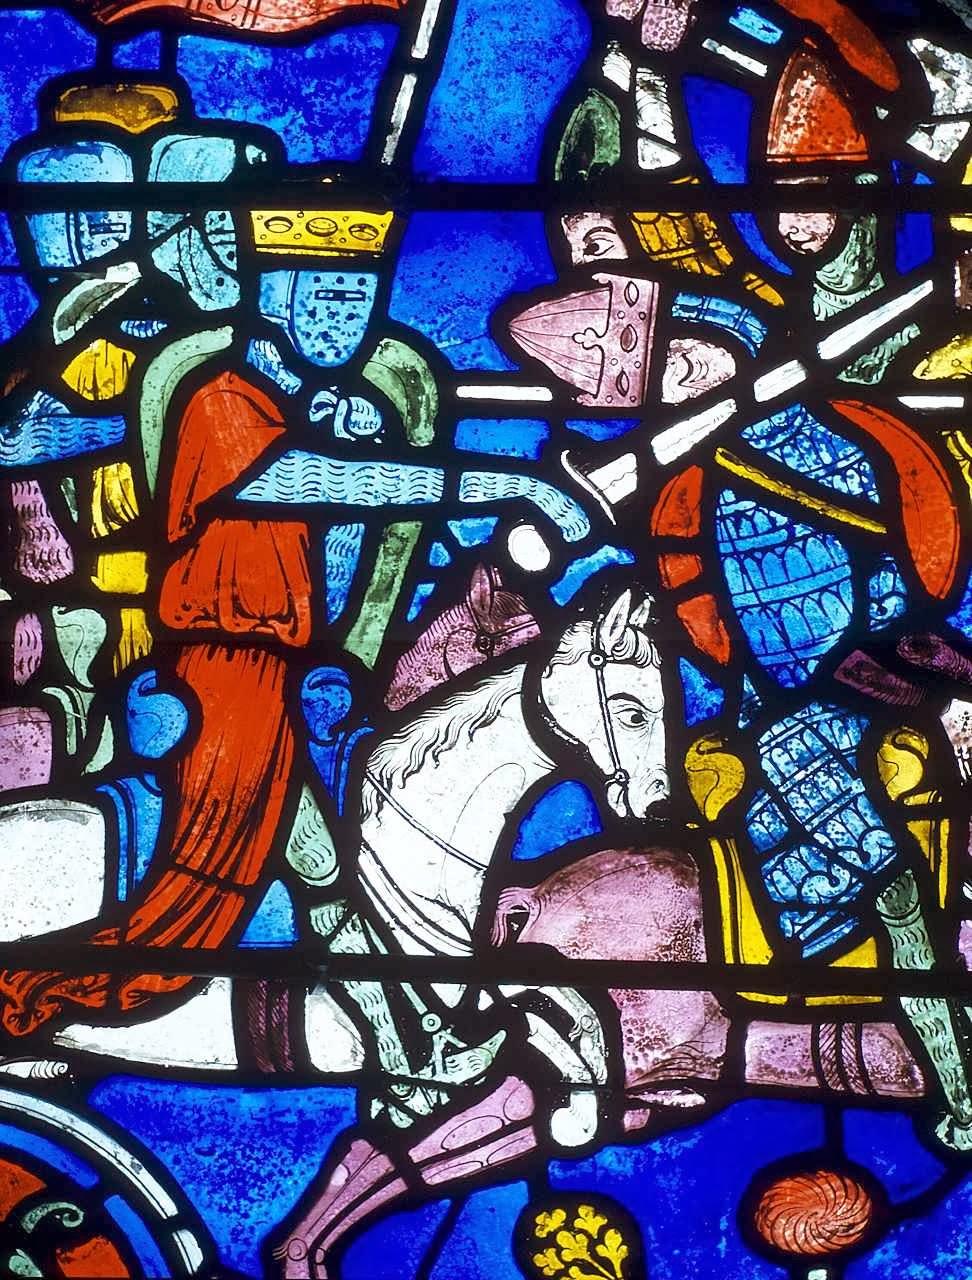 Carlos Magno deteve os fluxos invasores pagãos e islâmicos na Europa. Vitral de Carlos Magno. Catedral de Chartres, França